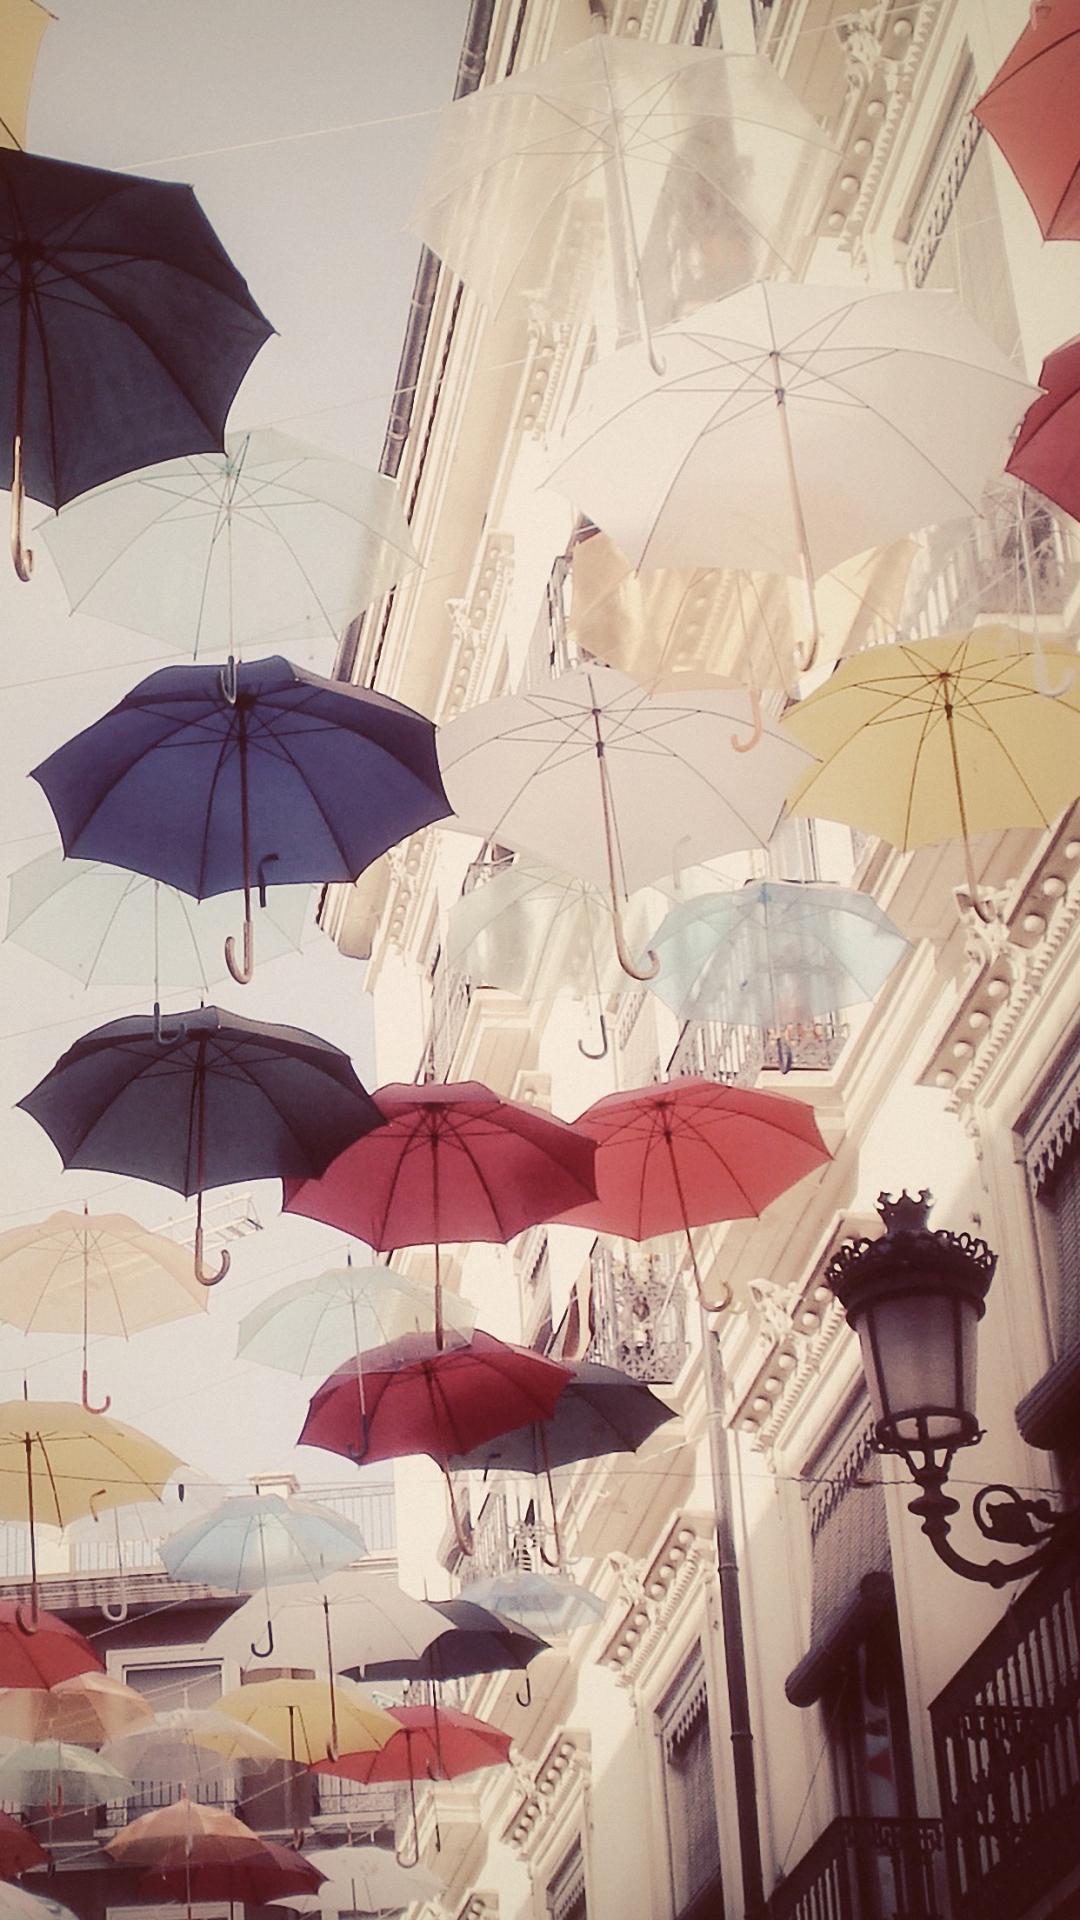 Wallpaper iphone umbrella - Cool Flying Umbrellas Iphone 6s Plus Wallpapers Hd